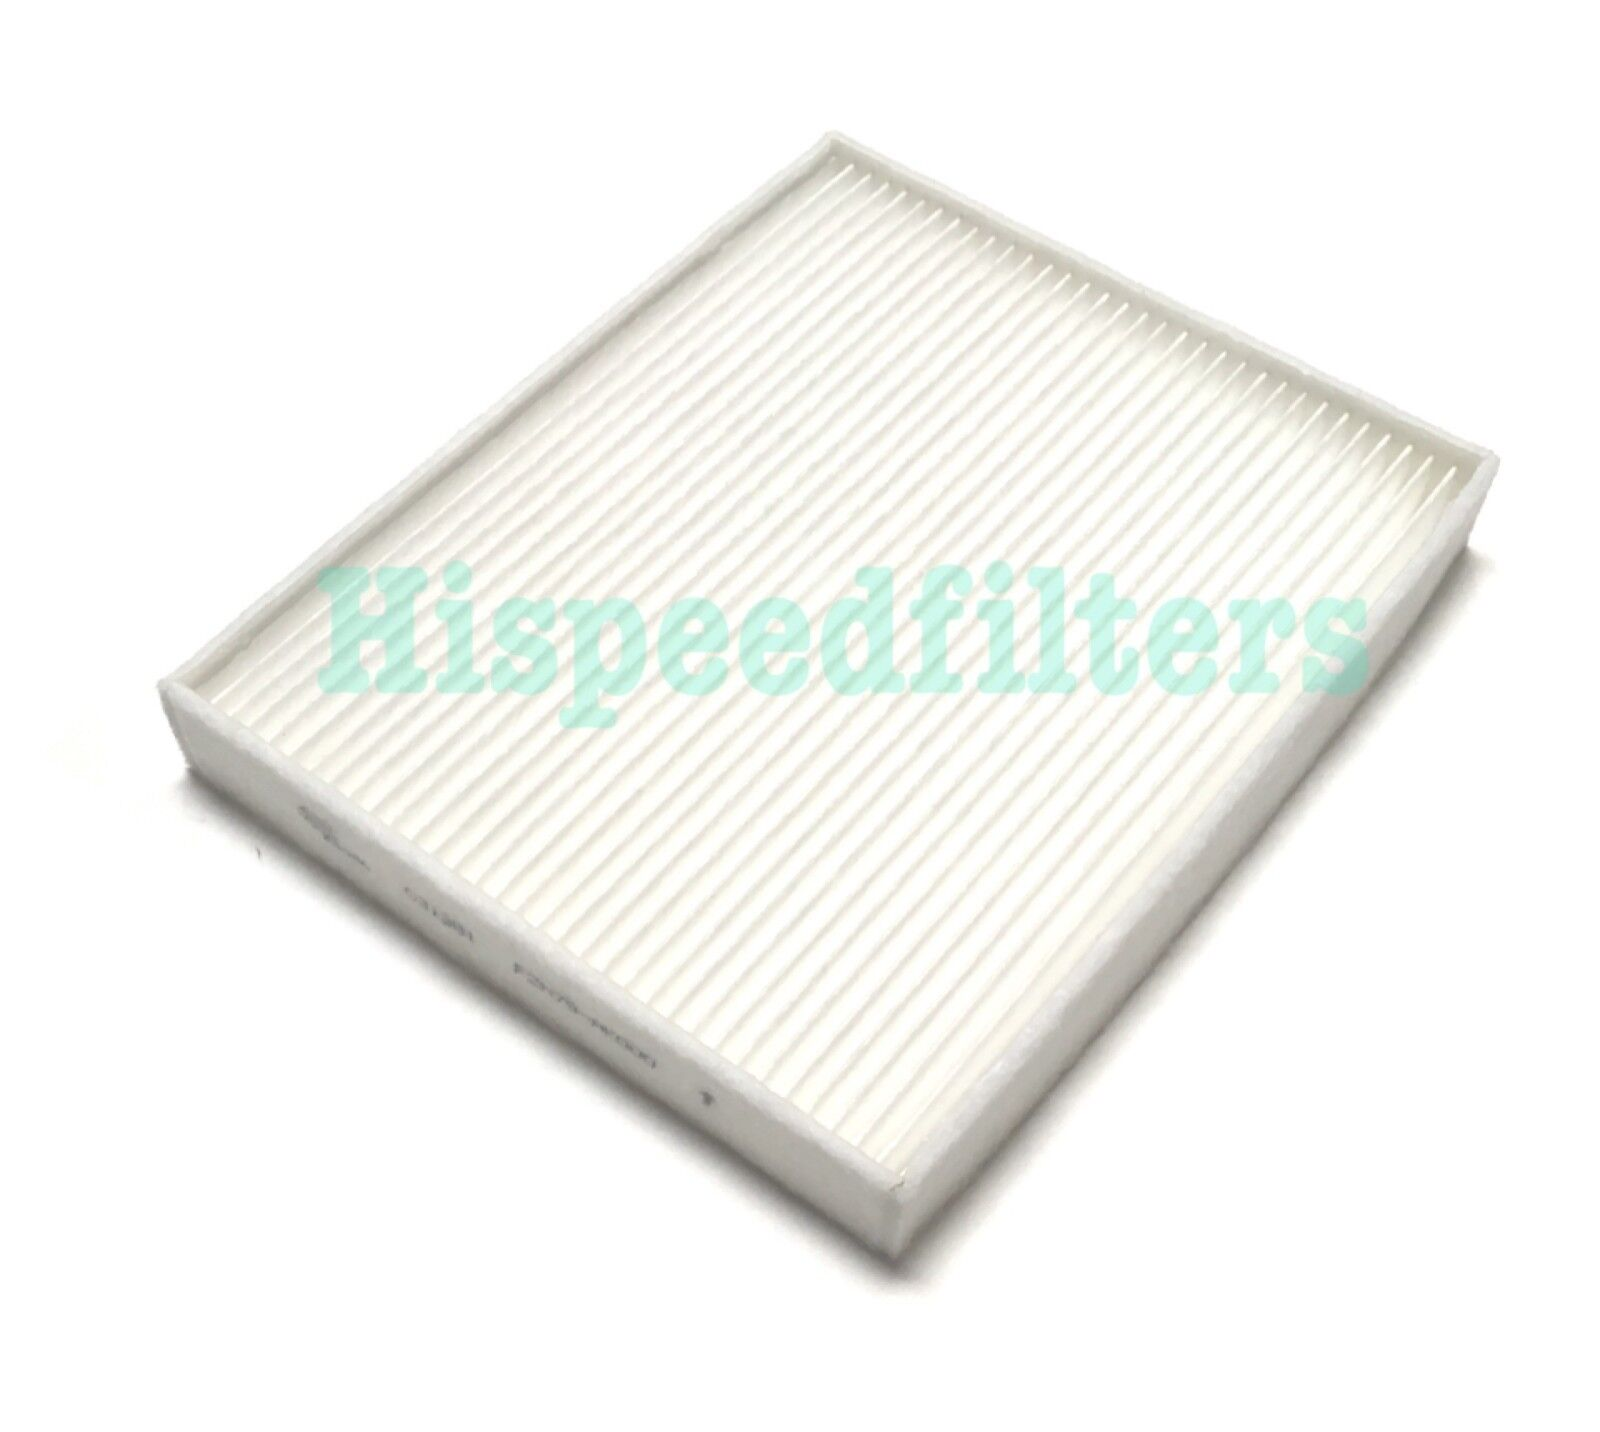 Carbonized Cabin Air Filter For 2017-2018 Hyundai Elantra US SELLER F2H79-AK000